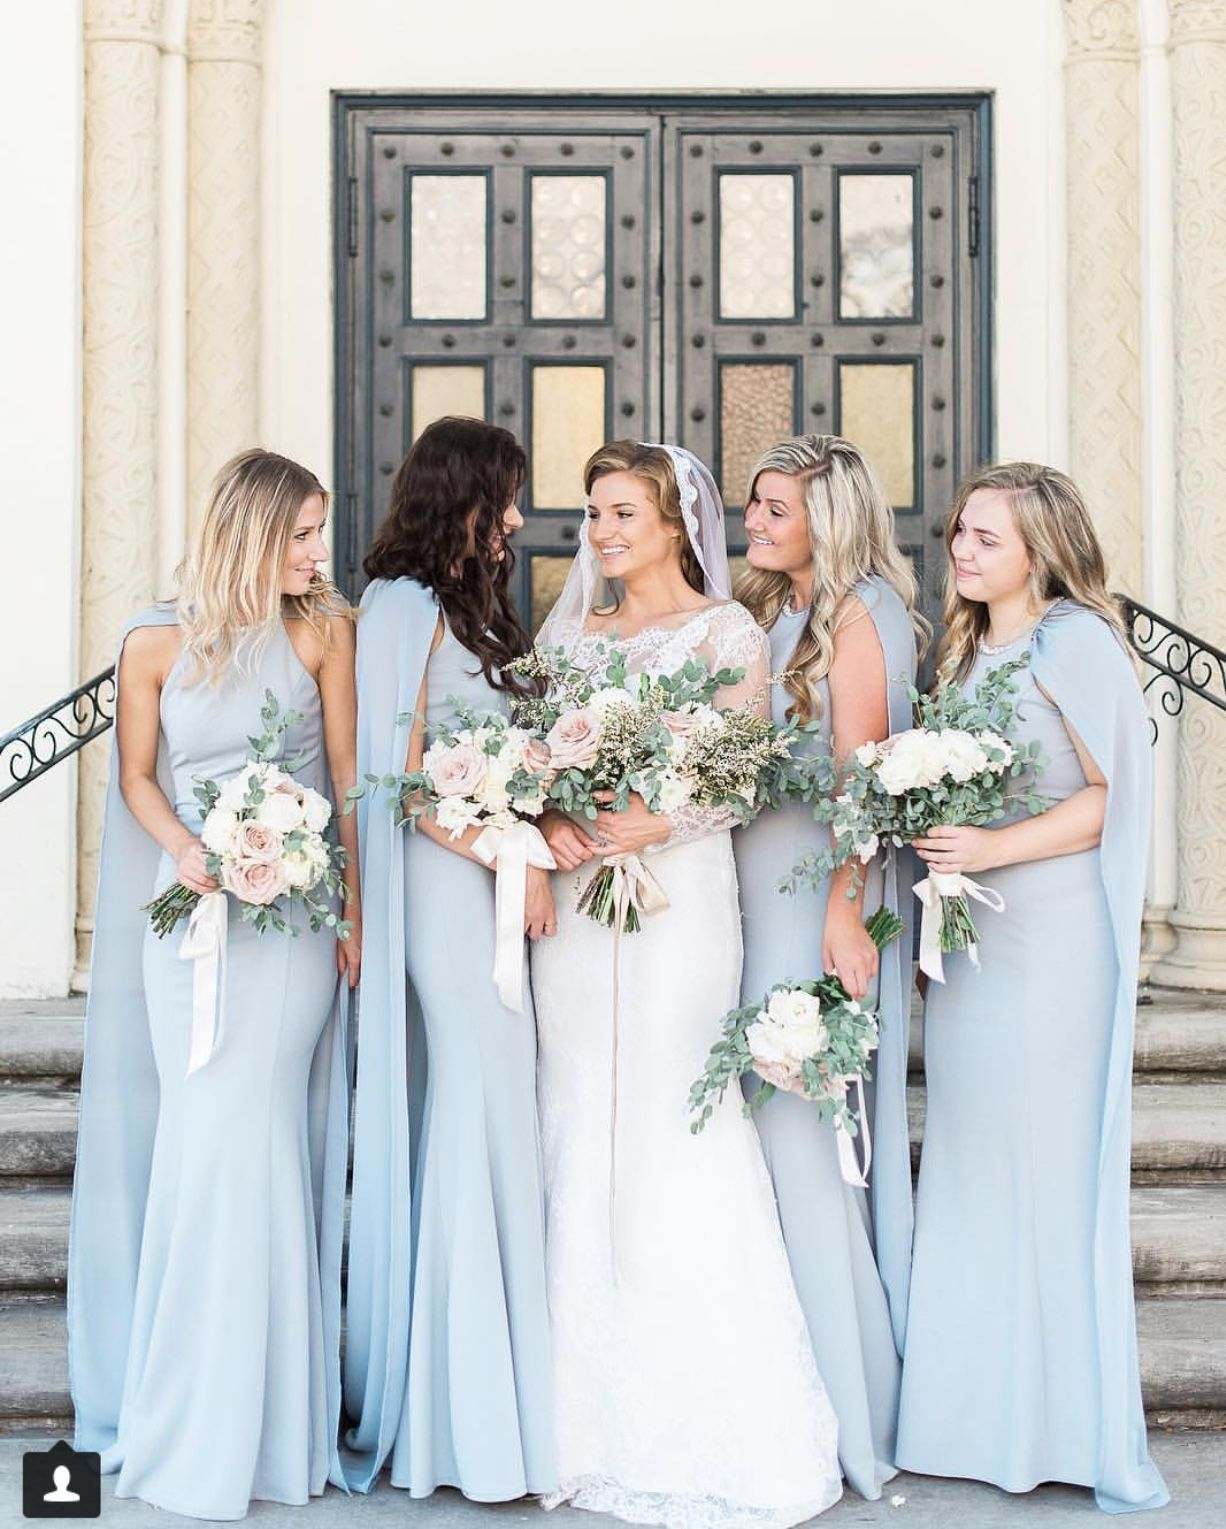 Dusty blue wedding weddings idea pinterest wedding dusty blue